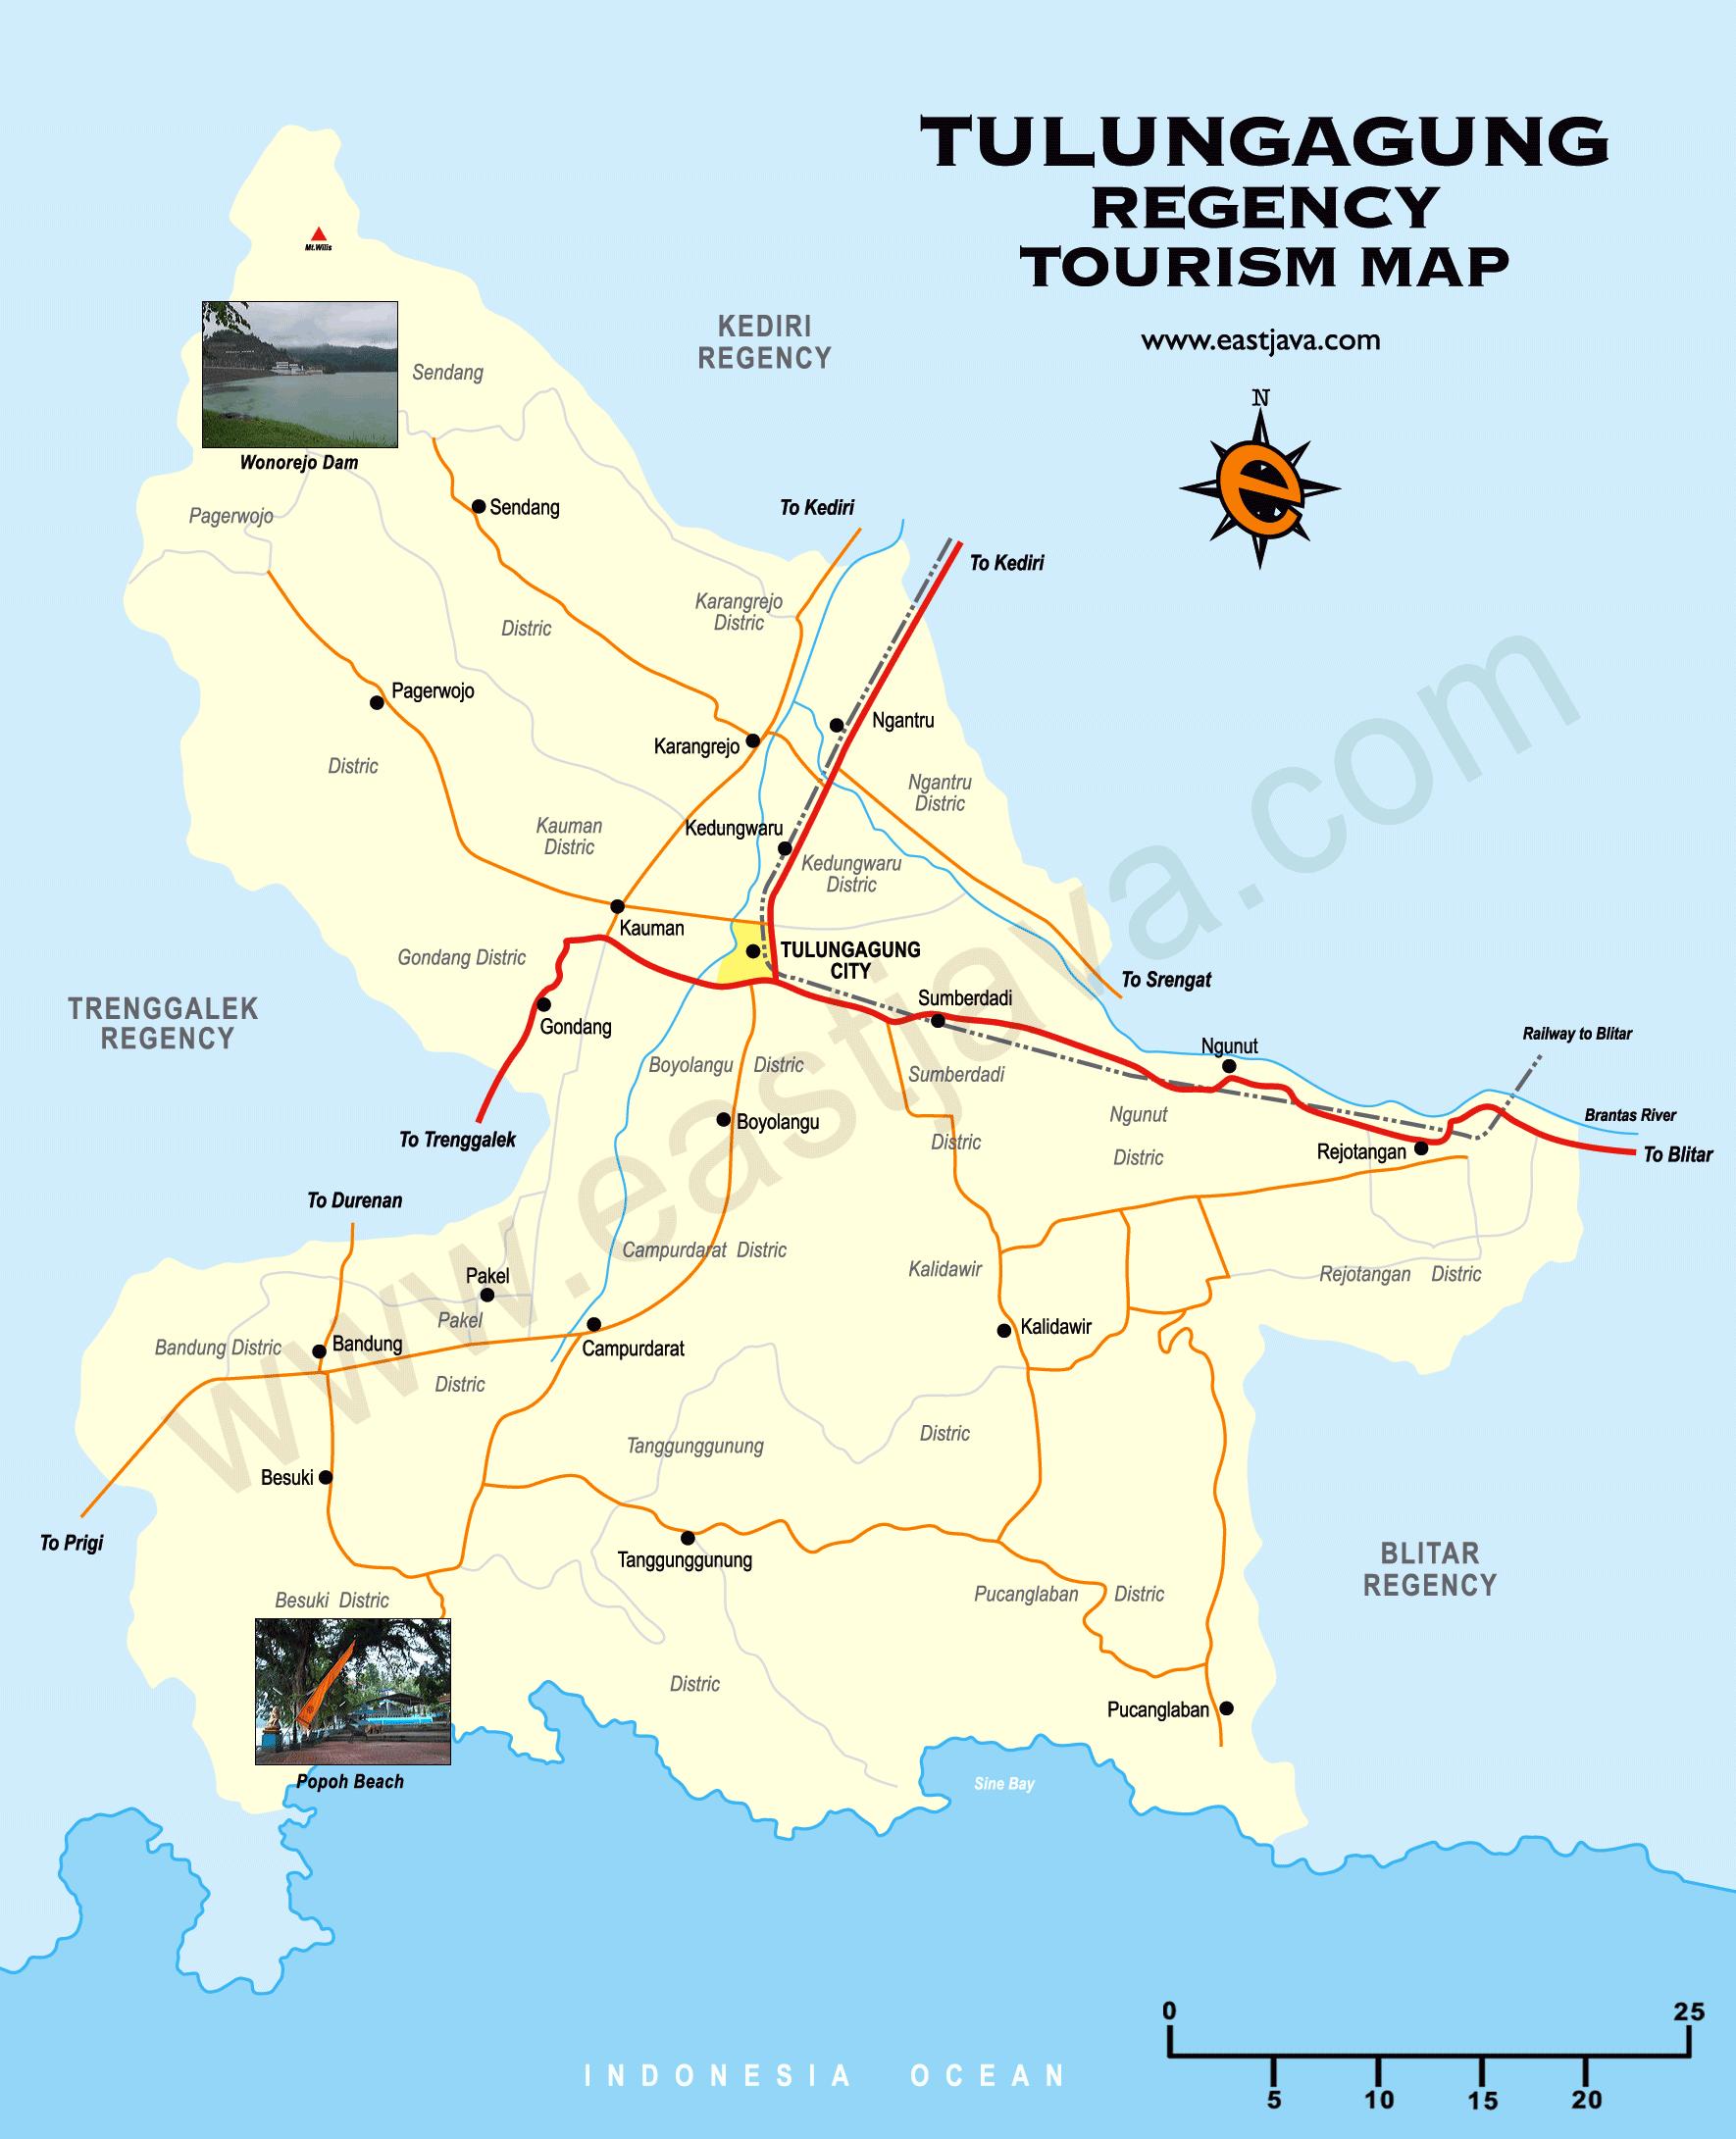 Peta Kabupaten Dan Kota Tulungagung - Peta Wisata Tulungagung